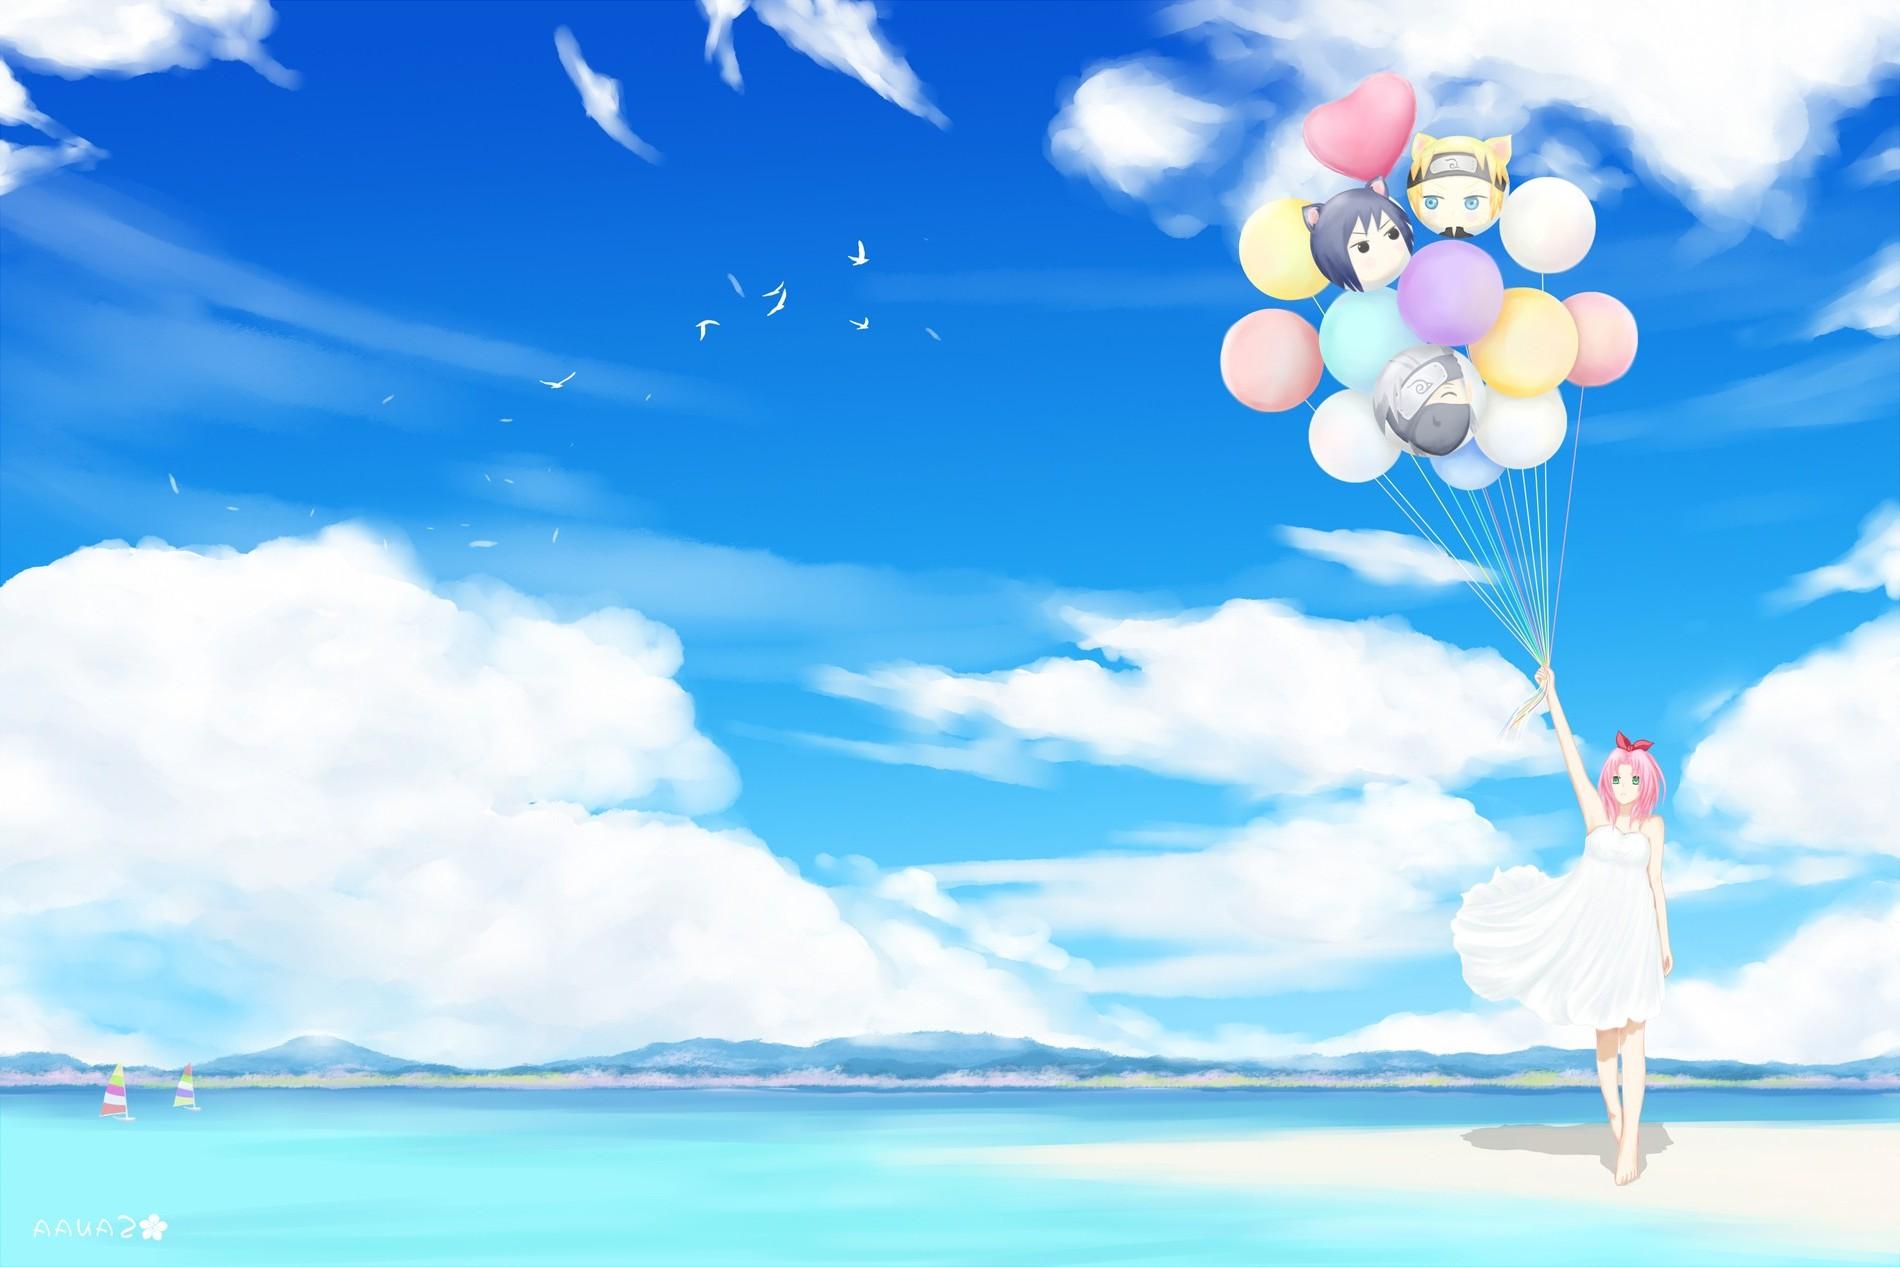 Good Wallpaper Naruto Blue - illustration-birds-anime-sky-clouds-blue-Naruto-Shippuuden-wind-Haruno-Sakura-Toy-cloud-flower-balloons-computer-wallpaper-1900x1267-px-586365  HD_371956.jpg